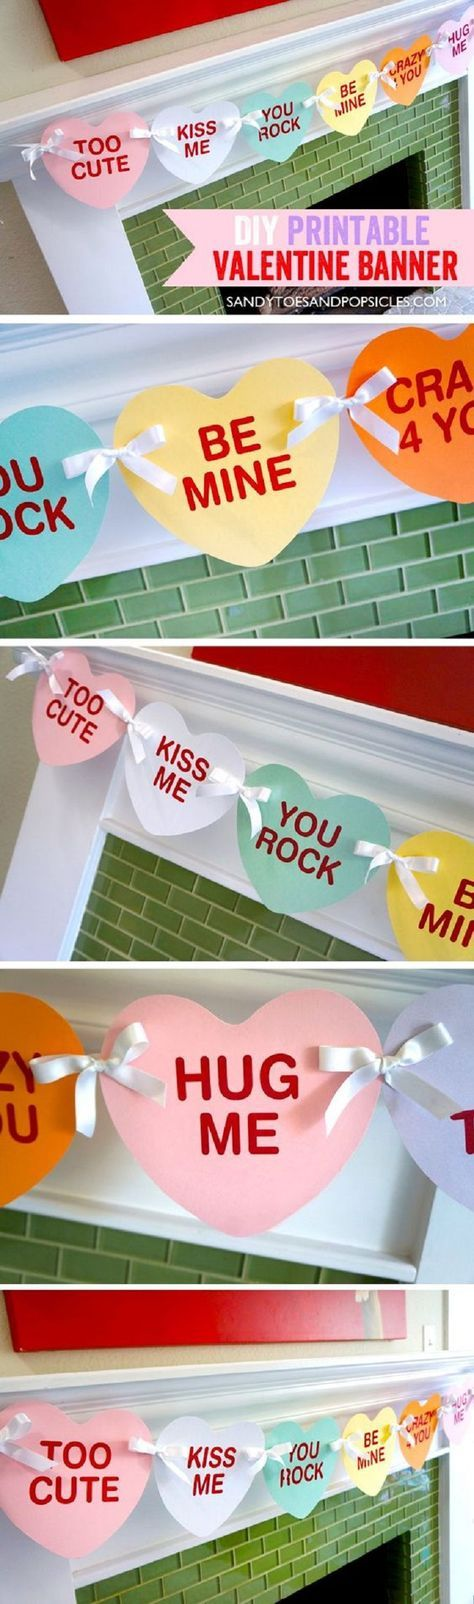 Easy DIY Valentine's Day Printable Banner #valentinesday #valentinesdaygift